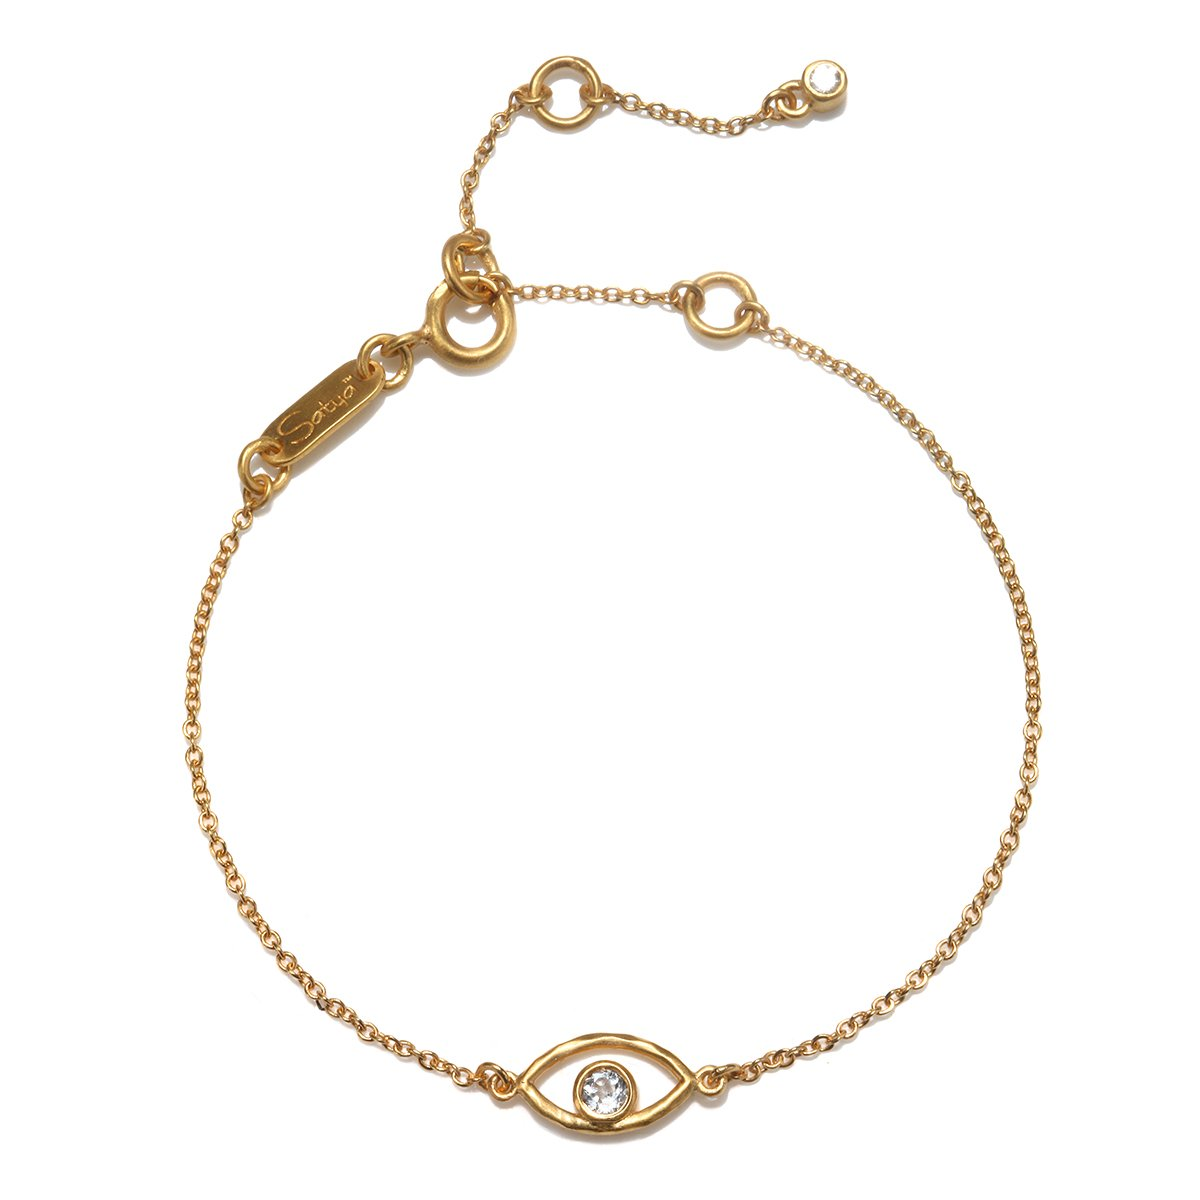 Satya Jewelry Women's Evil Eye Gold Charm Bracelet Adjustable, Gold, One Size